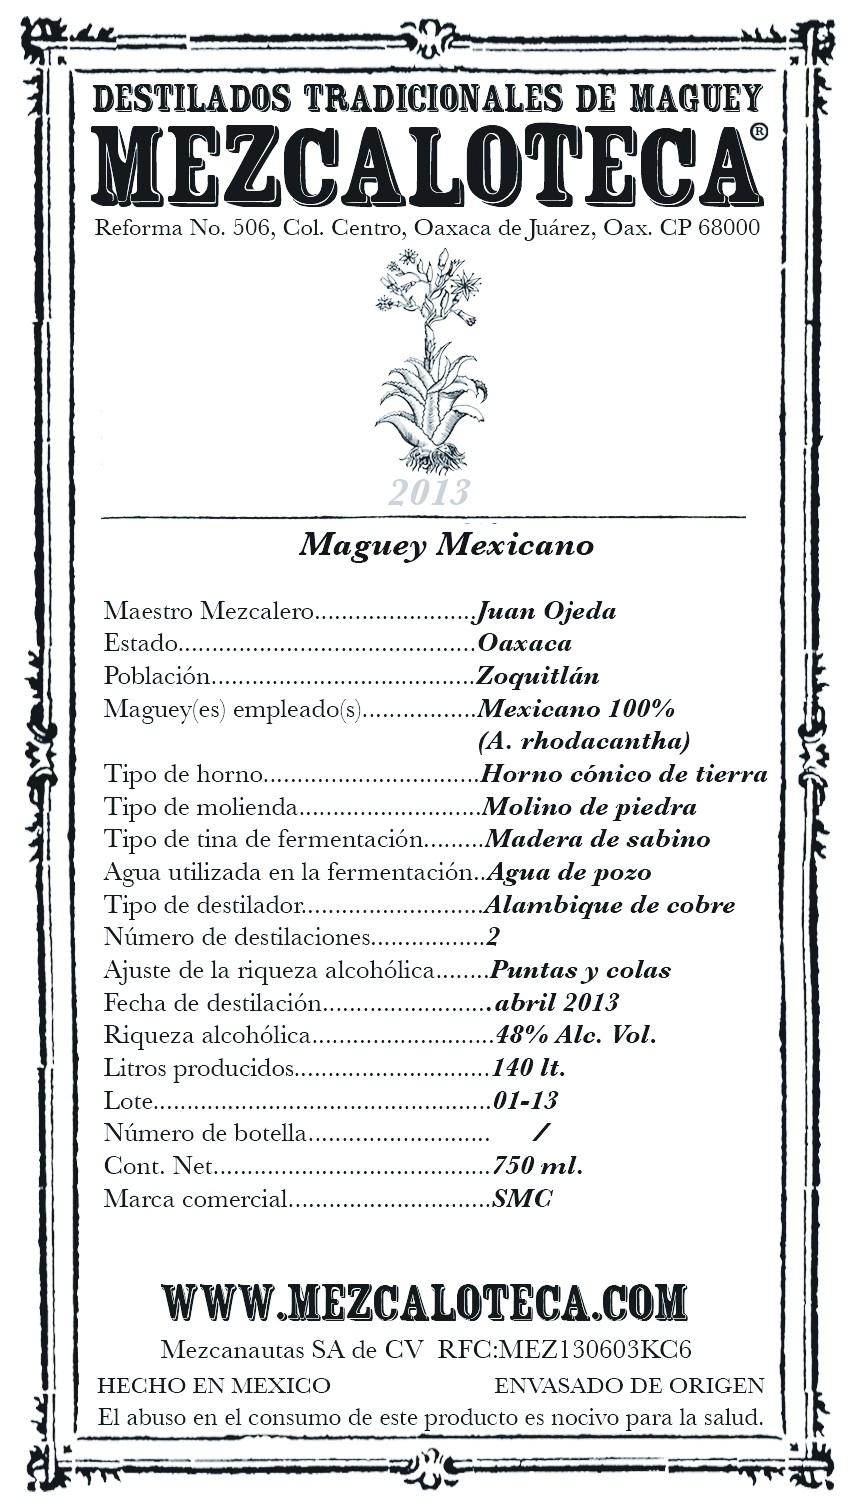 7.mexicano.JO.750.2013.zoquitlan web.jpg